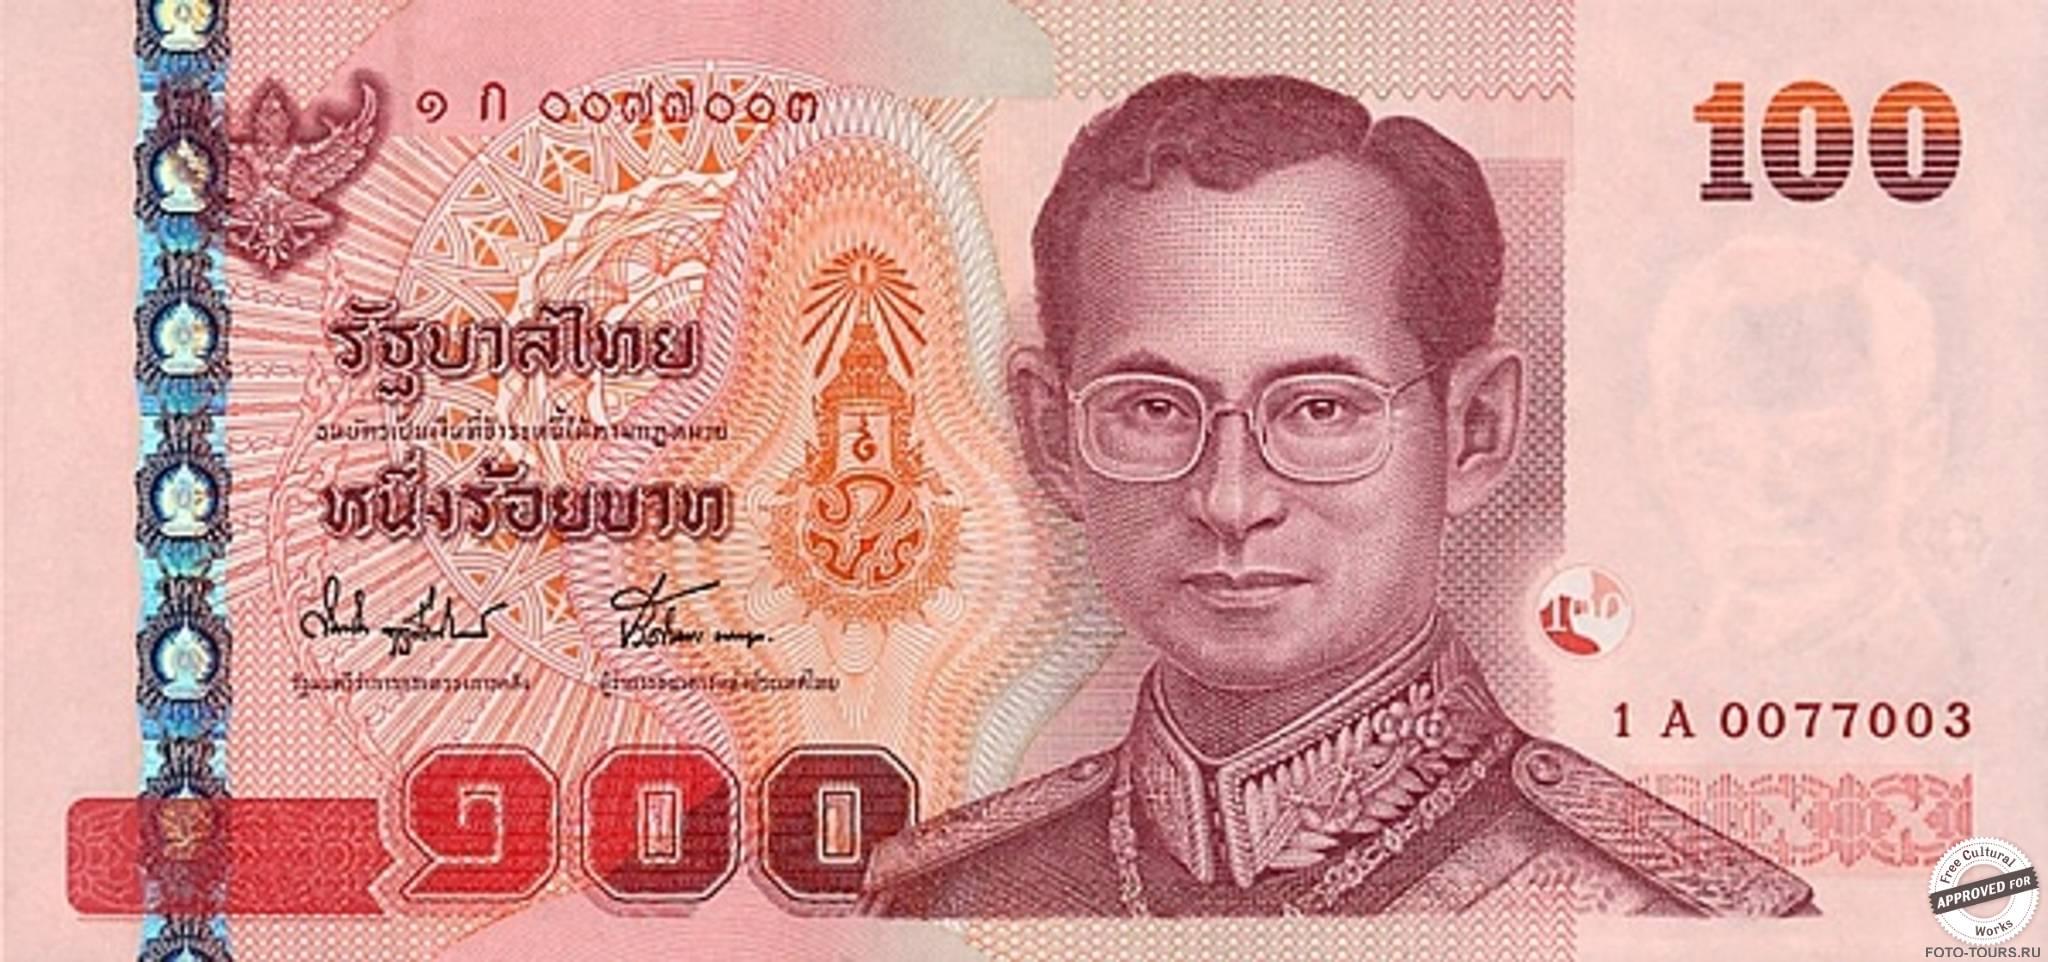 Валюта Таиланда, Таиланд, Азия.